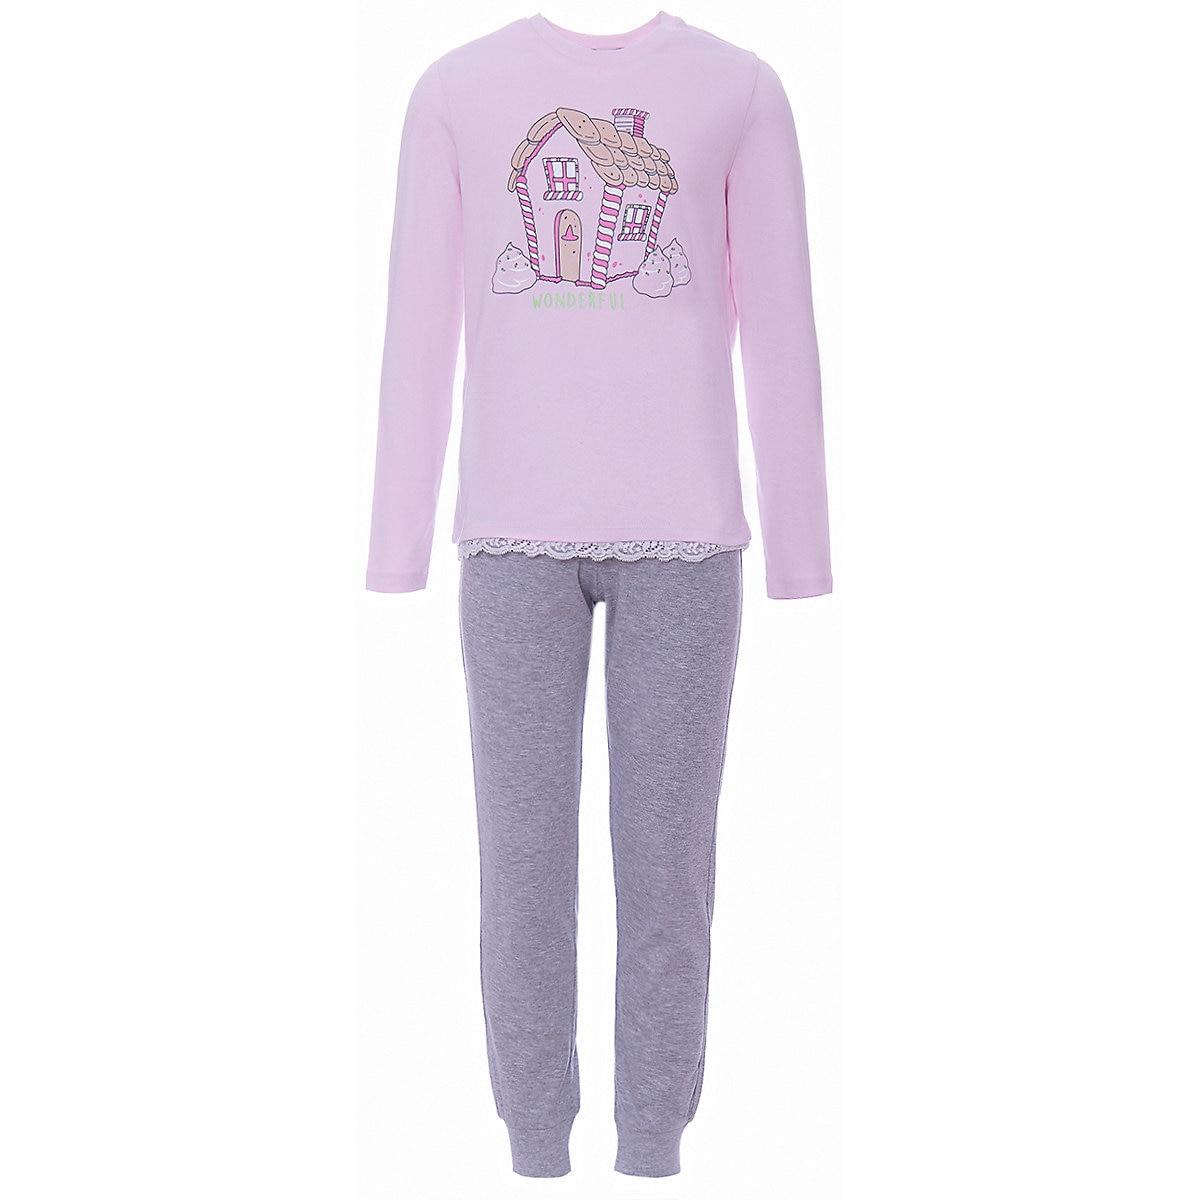 ORIGINAL MARINES Pajama Sets 9502001 Cotton Girls childrens clothing Sleepwear Robe parrot print cami pajama set with robe